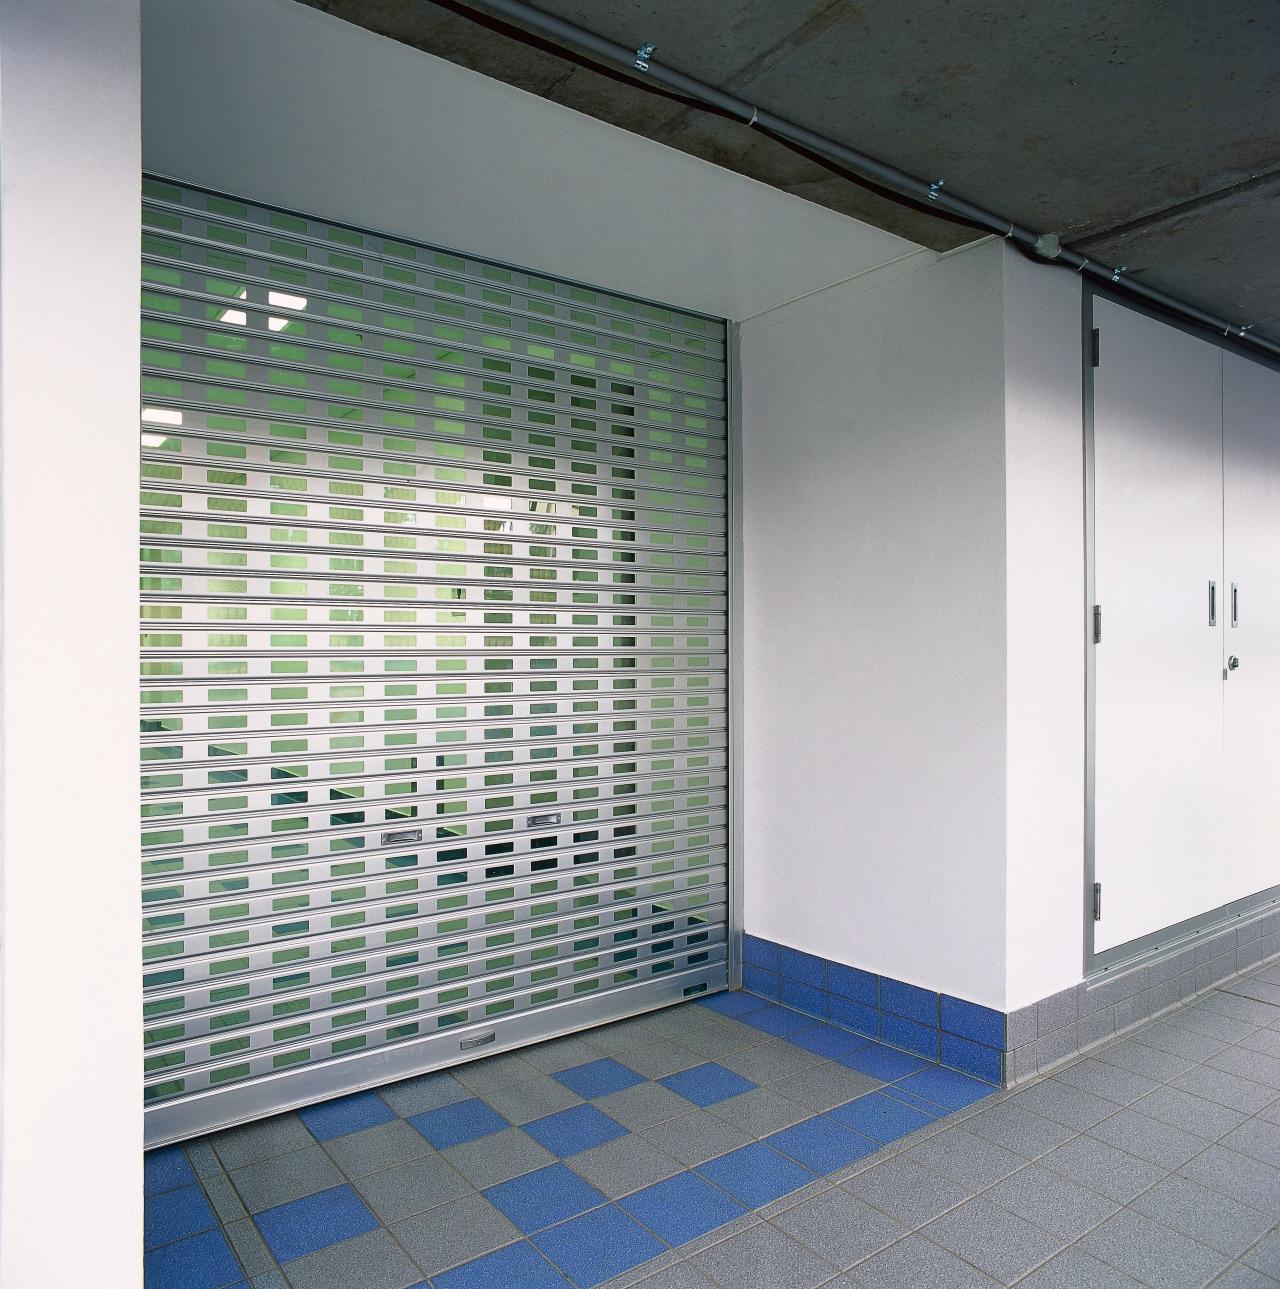 View of slotted aluminium roller shutter door. architecture, daylighting, glass, wall, gray, white